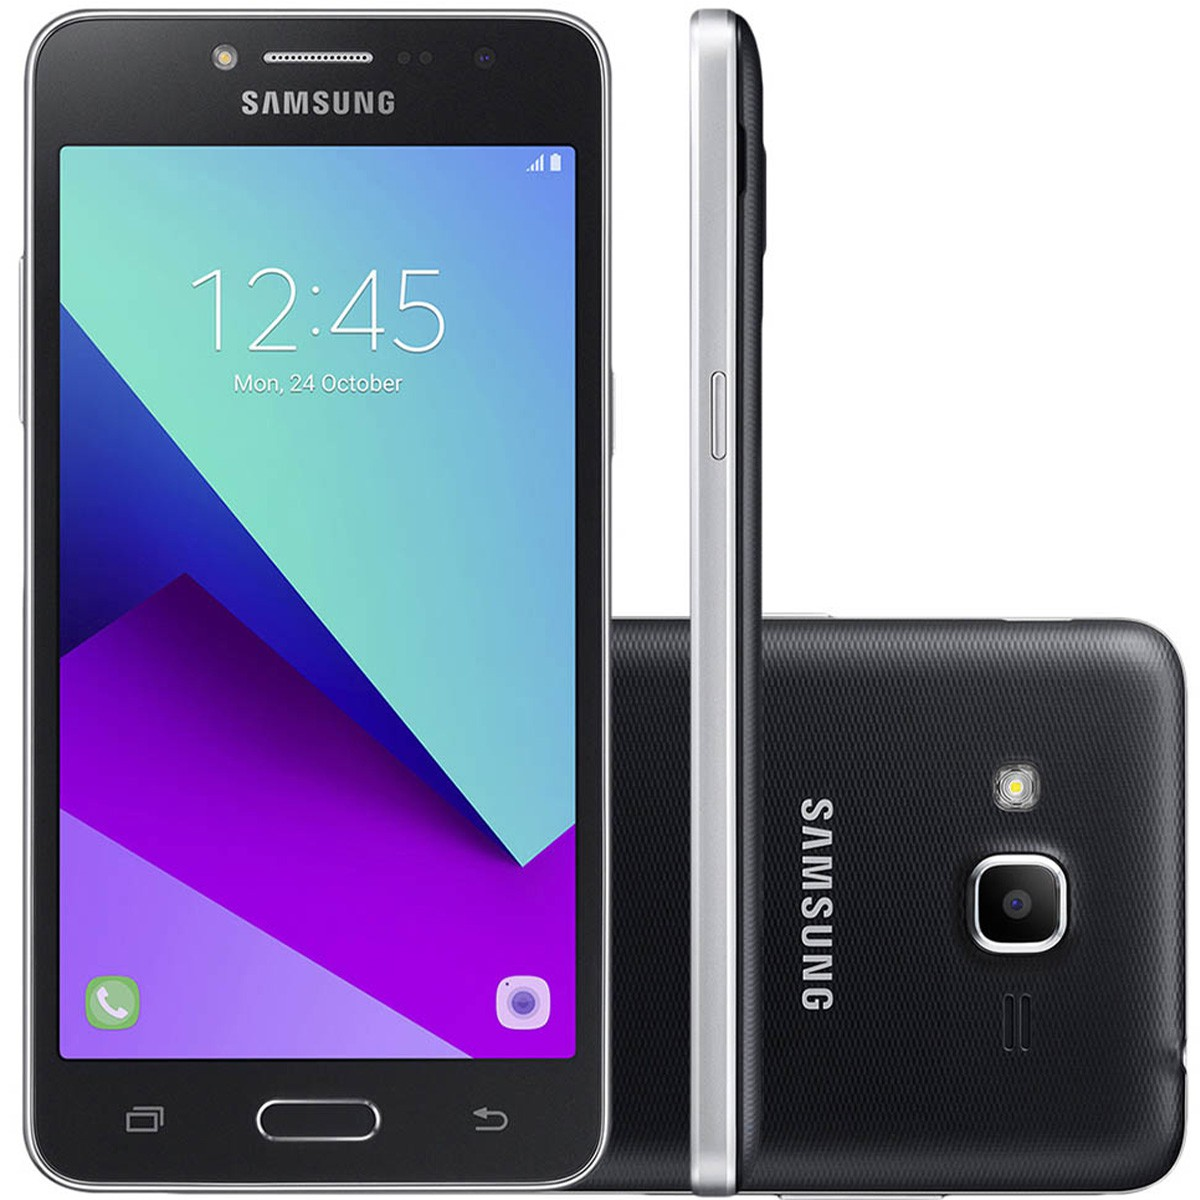 USADO: Samsung Galaxy J2 Prime Tv G532 Dual 8gb Cam 8mpx